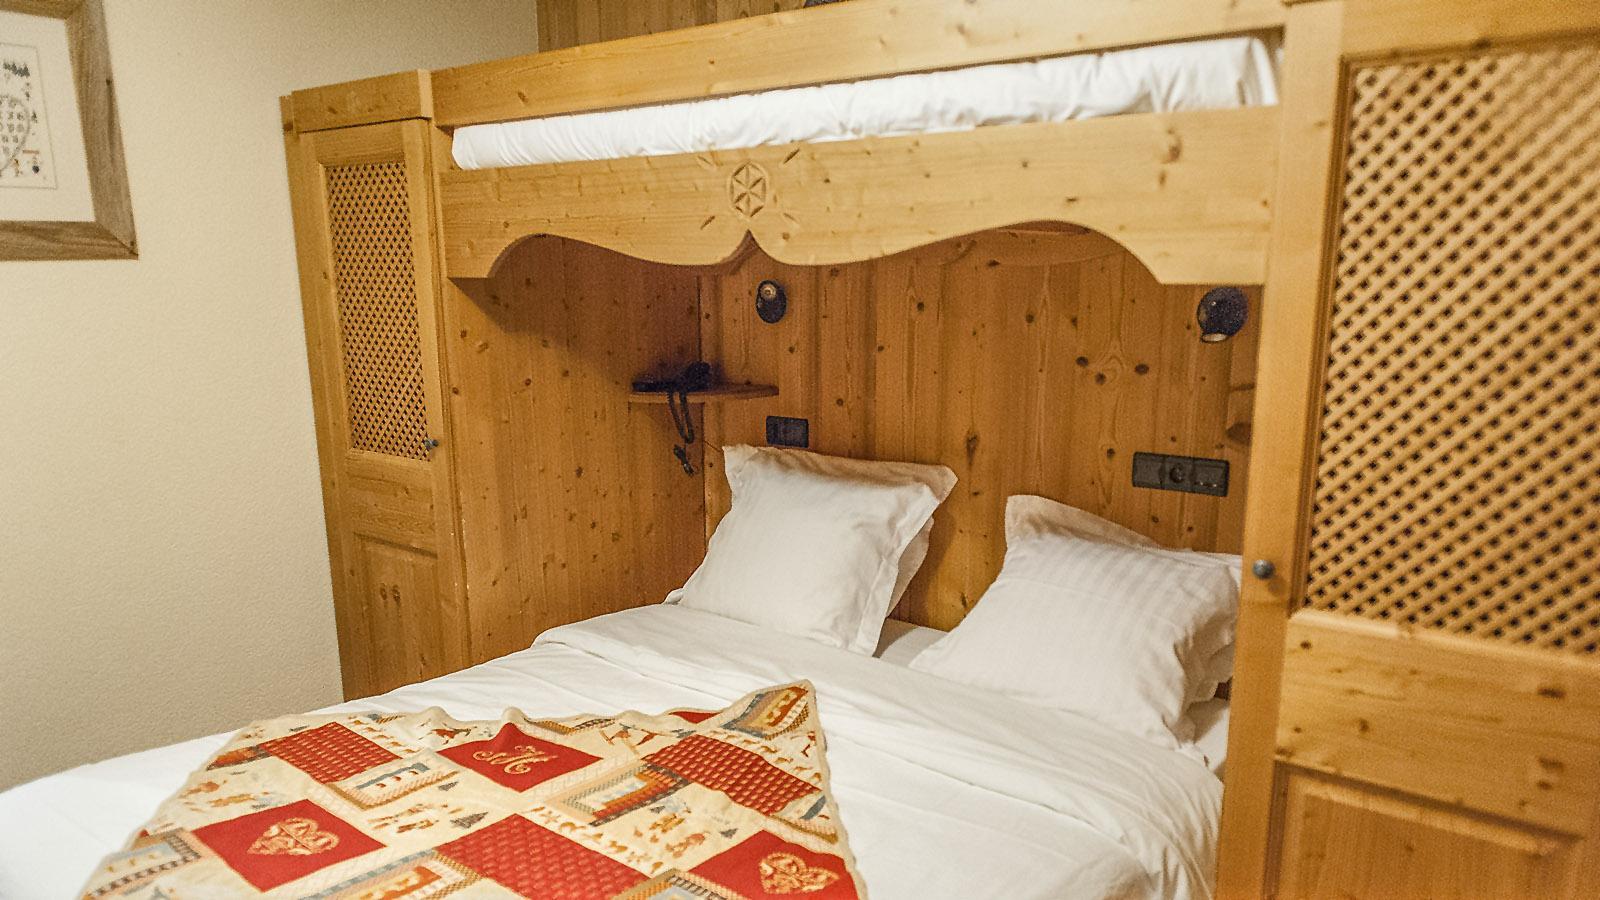 Schlafkammer im Hotel Les Écureuils von Le Grand Bornand. Foto: Hilke Maunder